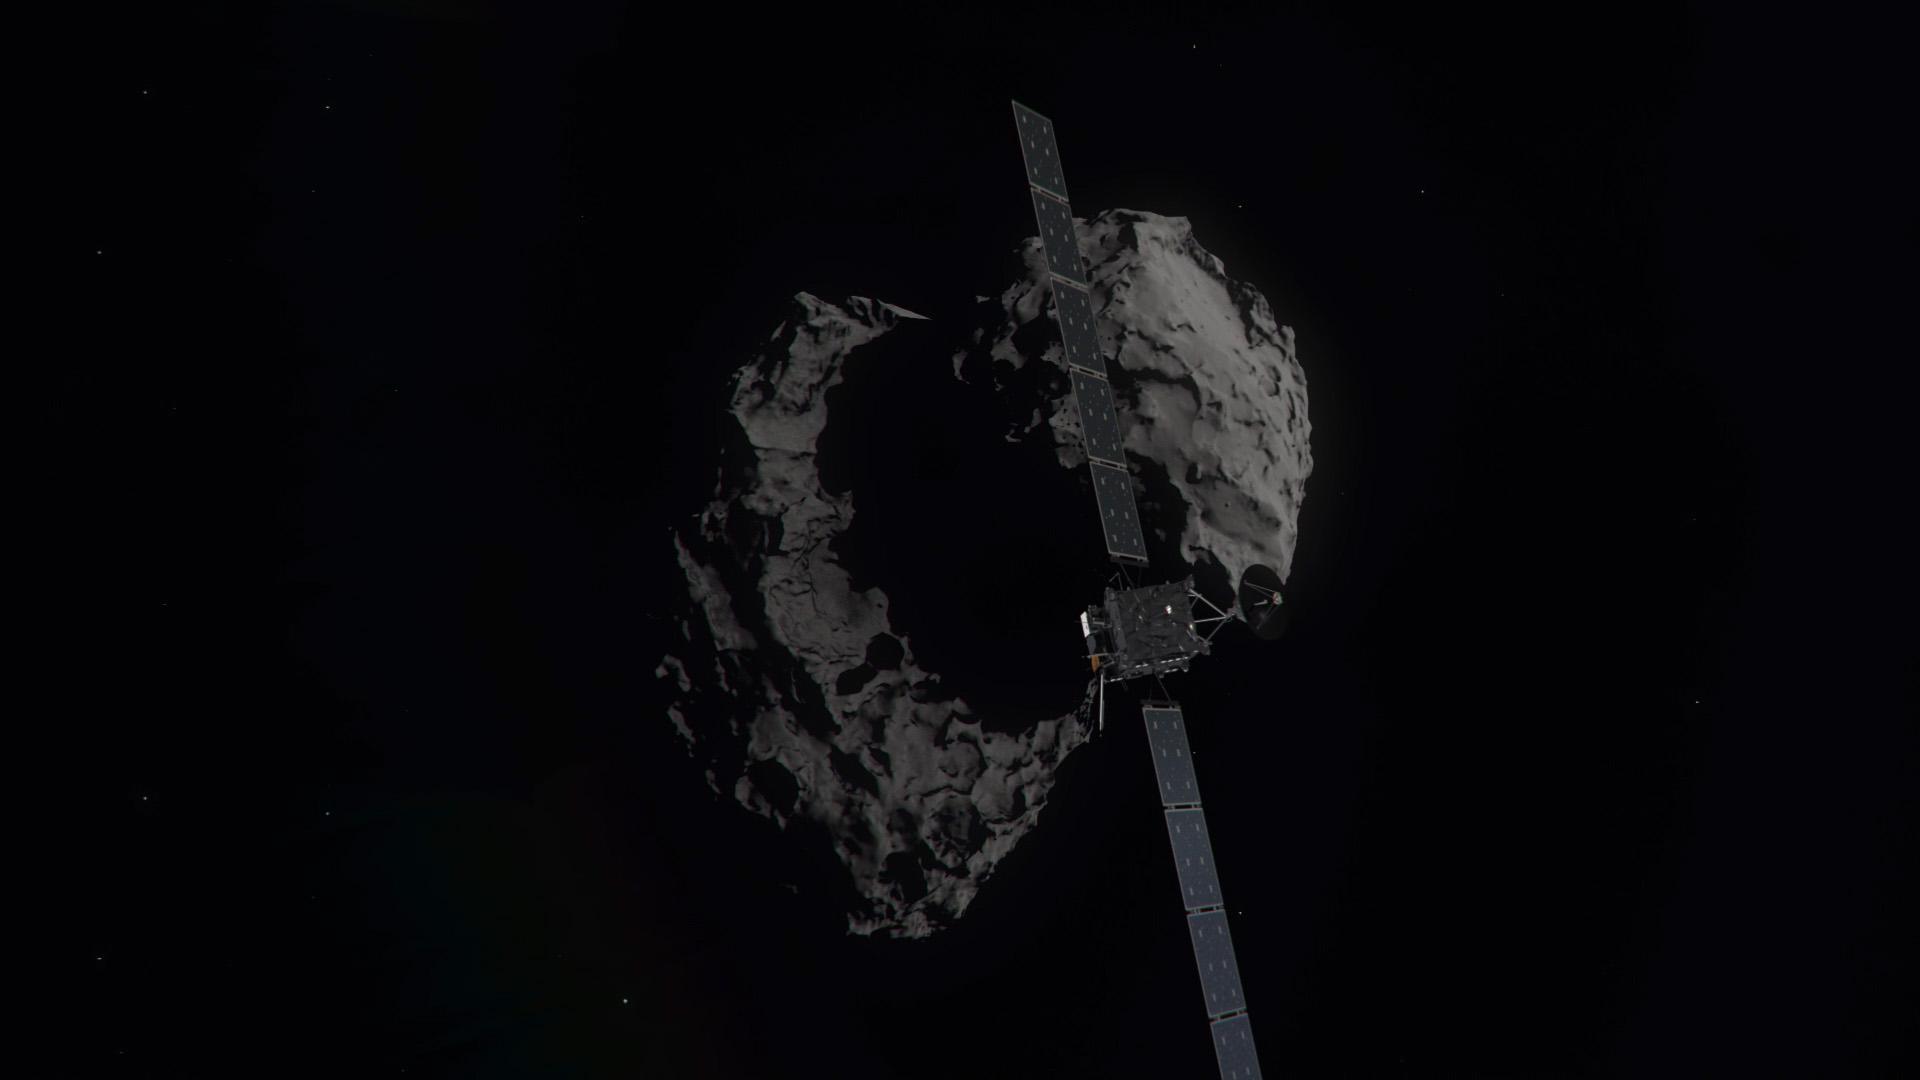 Space in Images - 2016 - 09 - Rosetta's descent